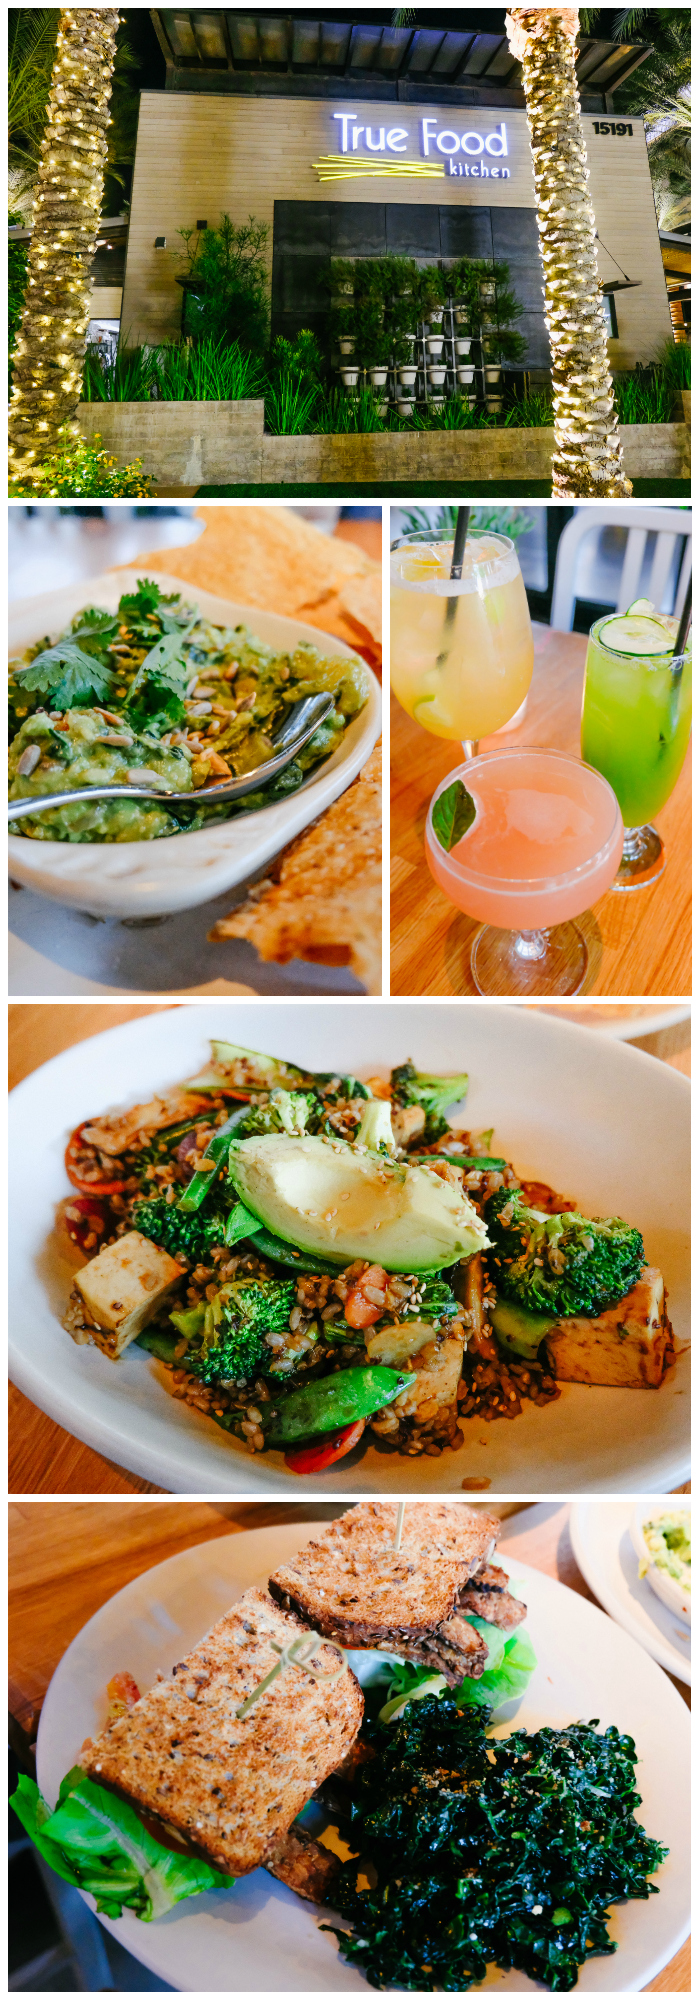 Vegan-Friendly True Food Kitchen in Scottsdale AZ